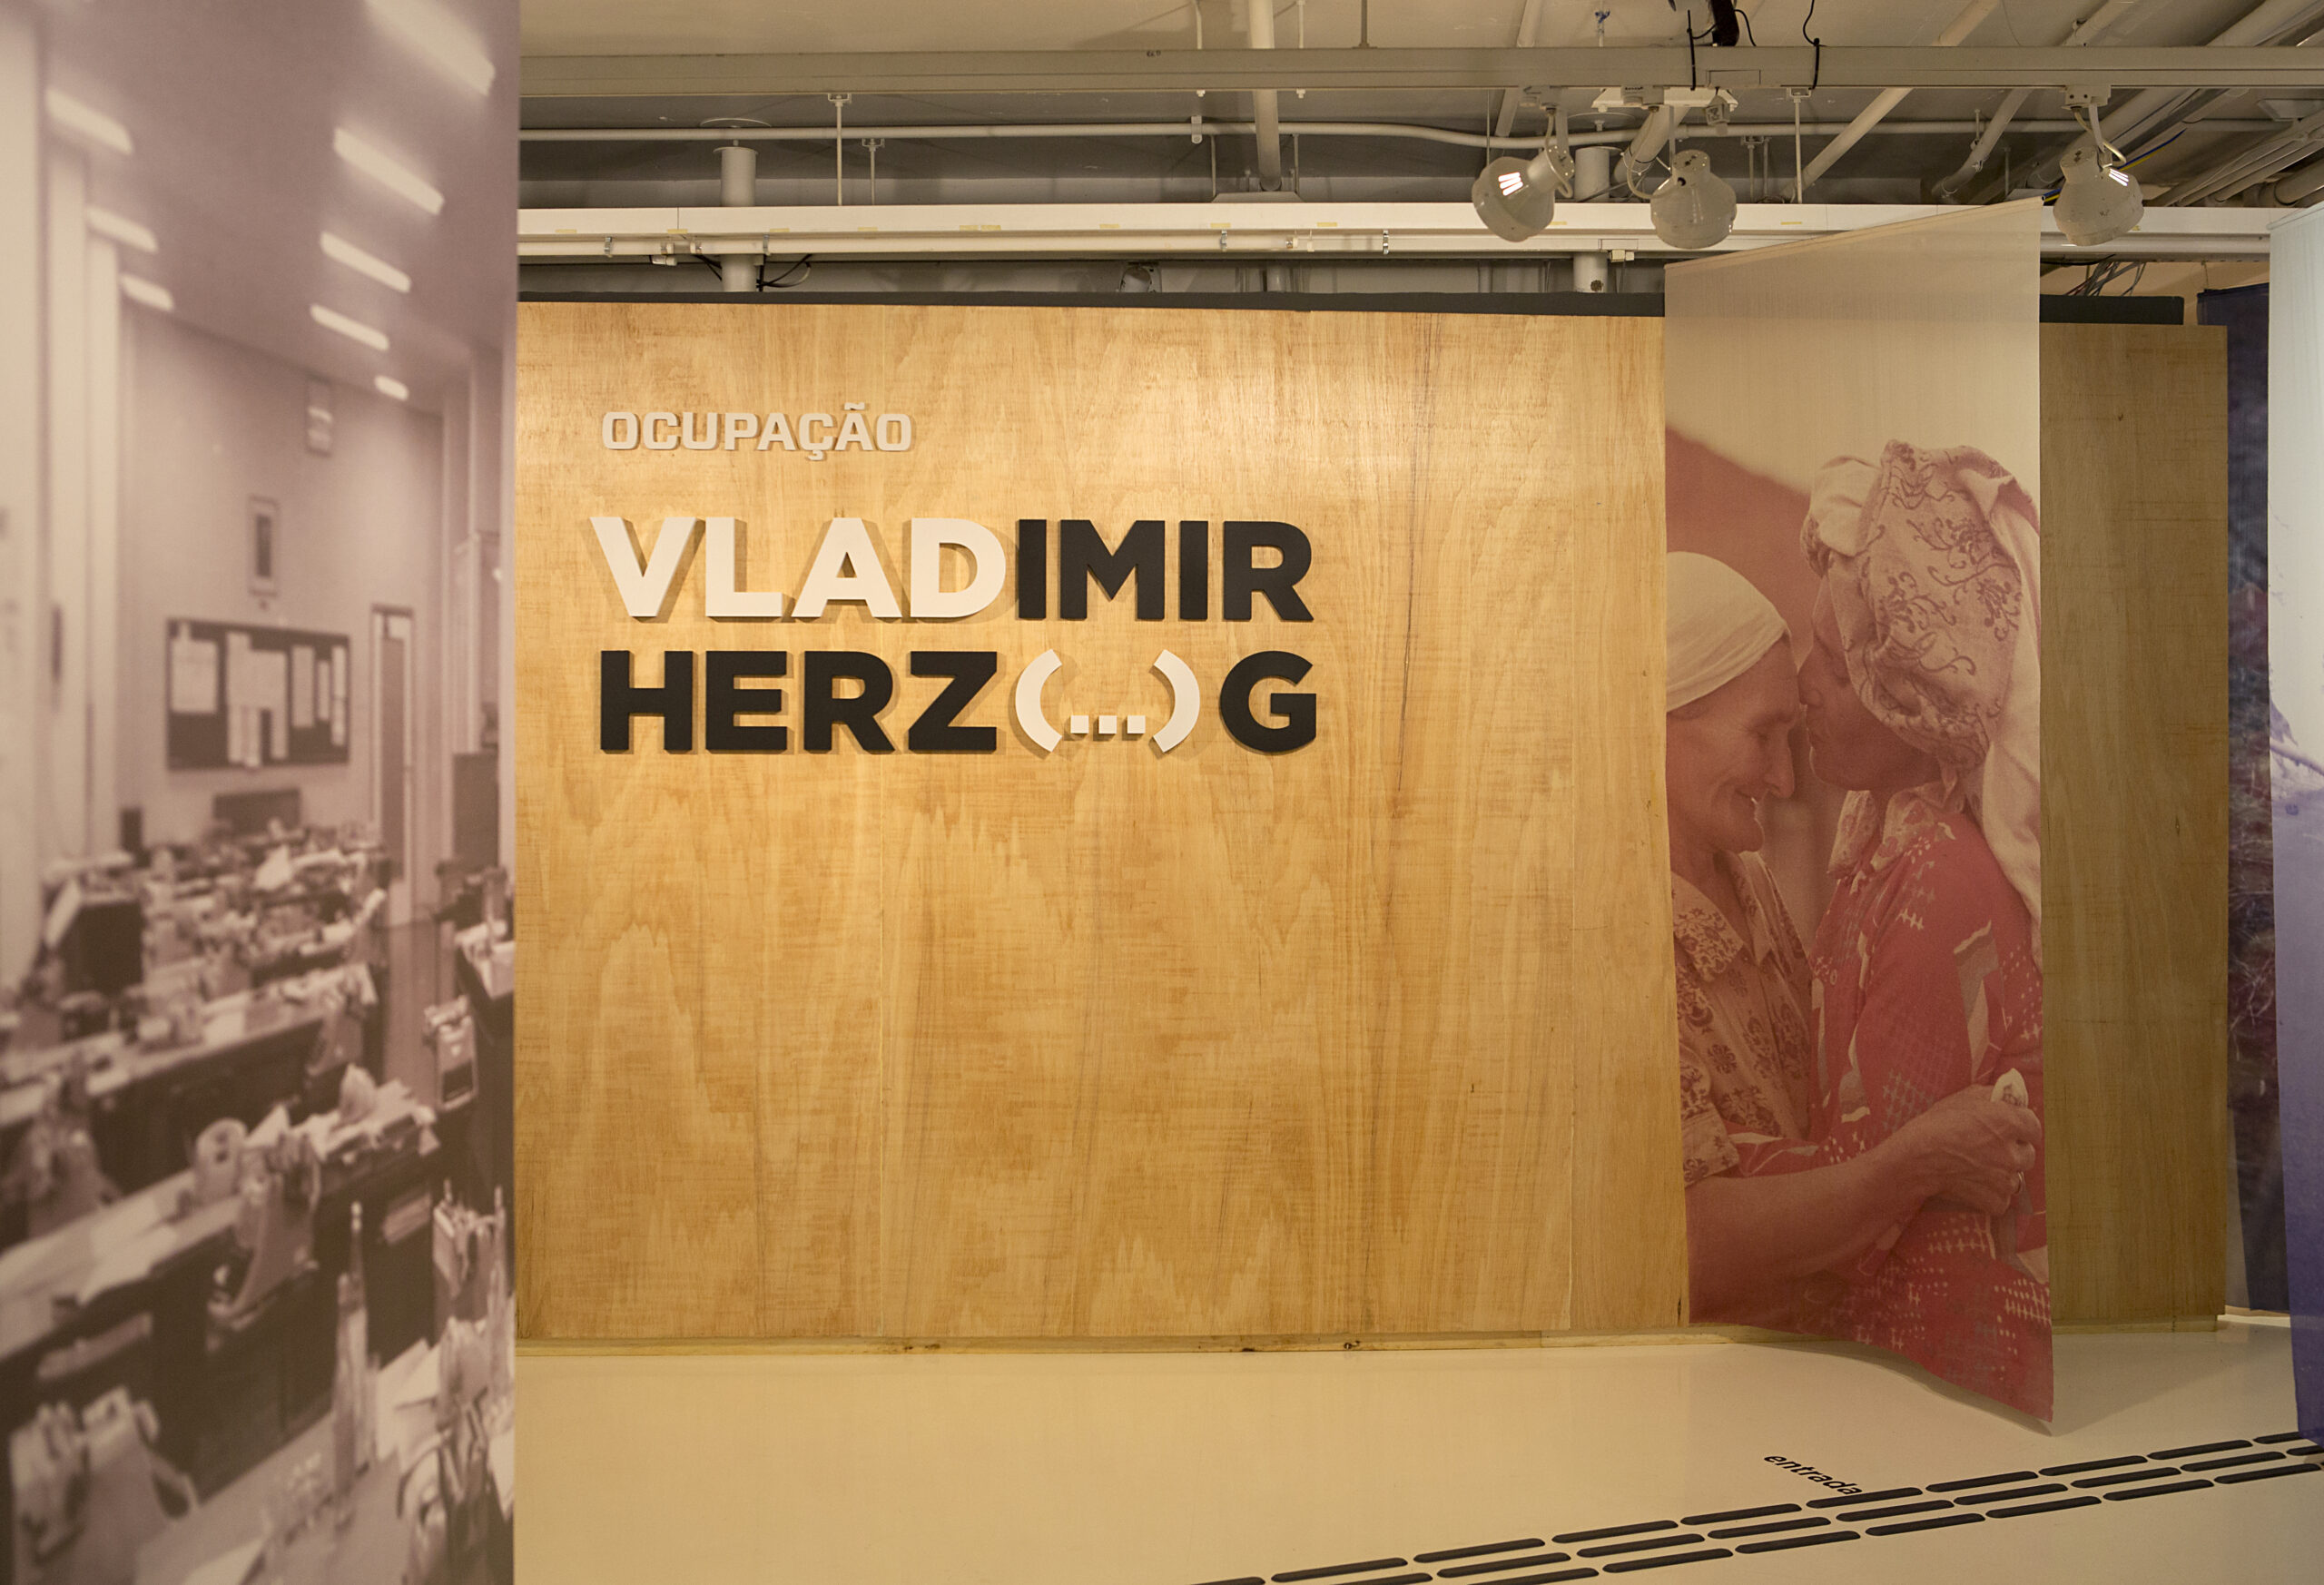 Ocupação Vladimir Herzog